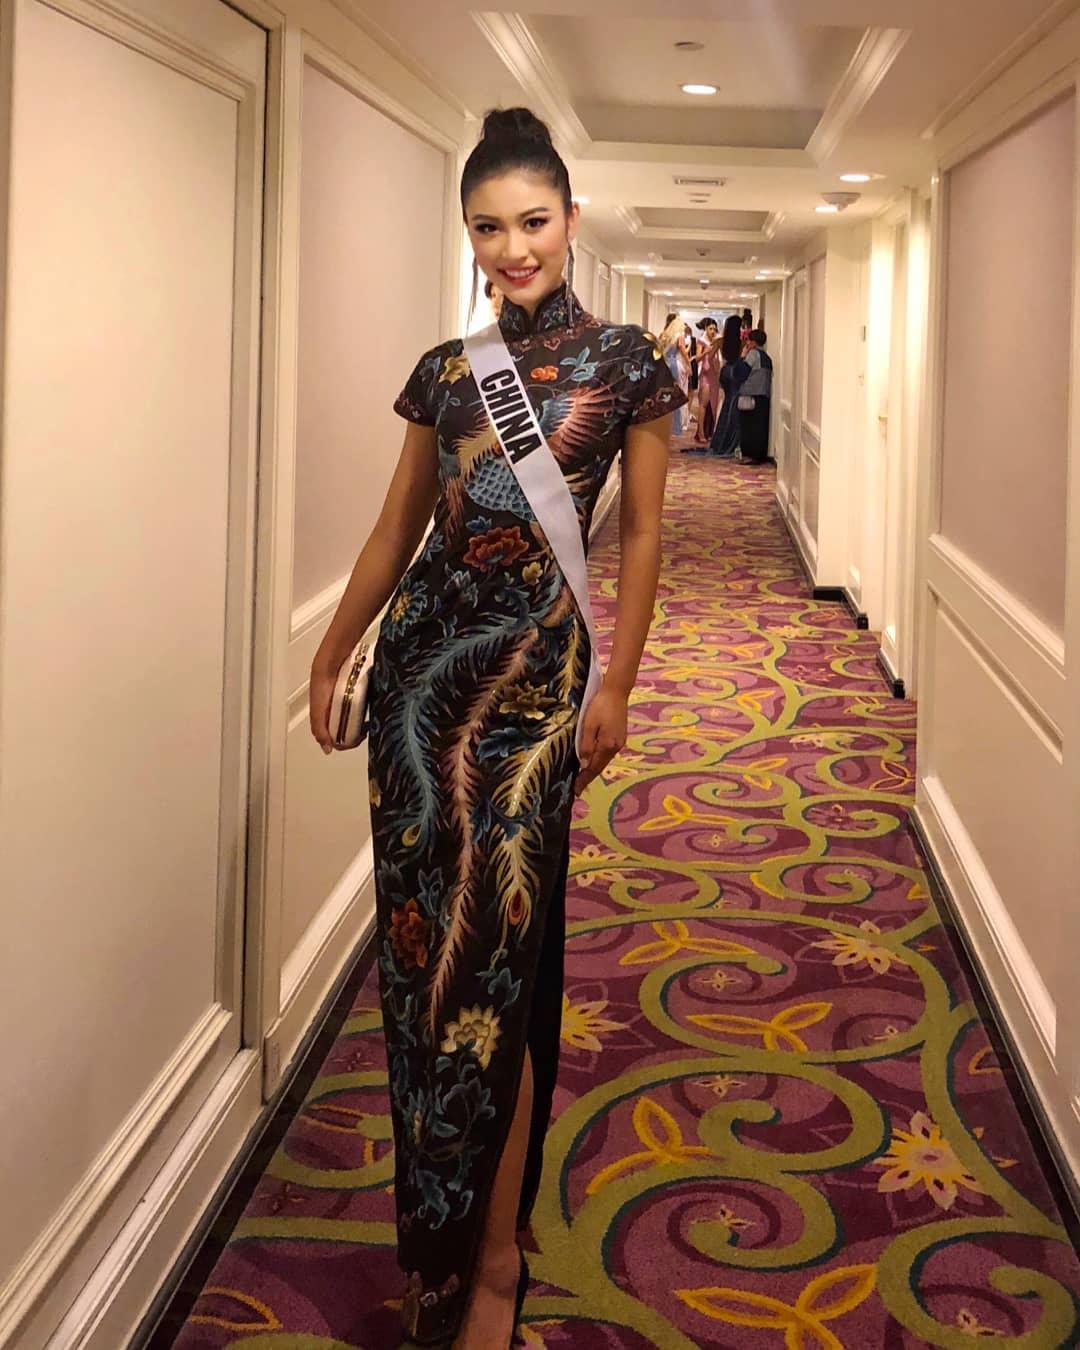 welcome dinner de candidatas a miss universe 2018. - Página 10 Mpbimt54